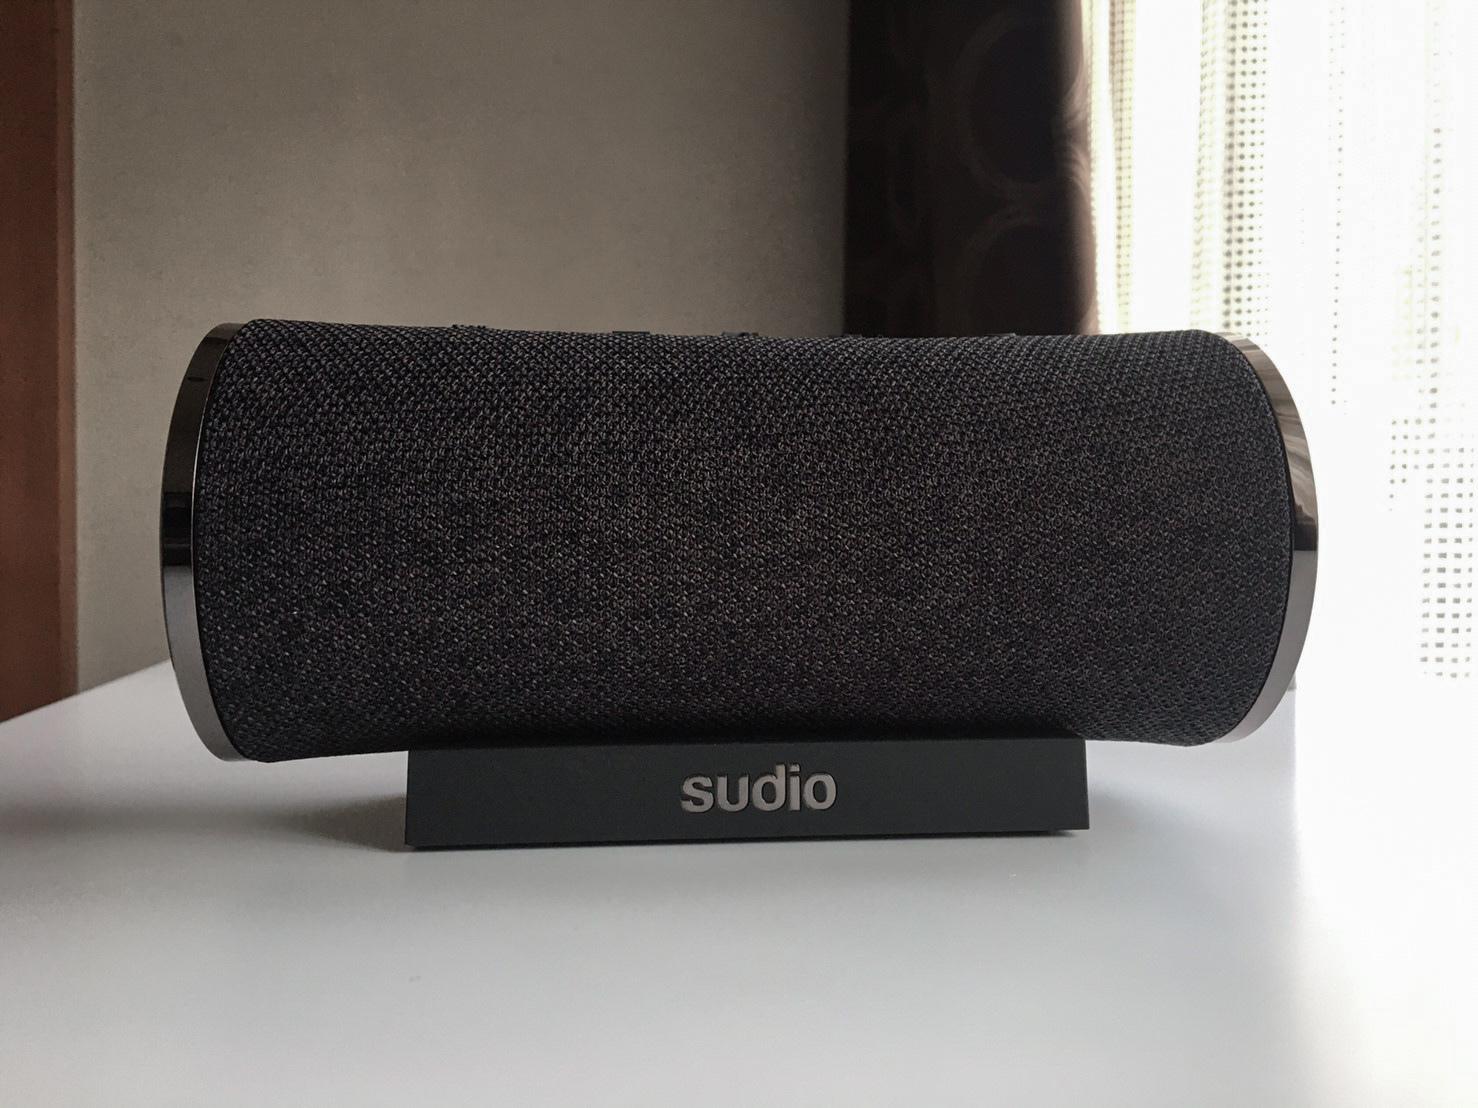 sudio-femtio藍牙喇叭-18.jpg